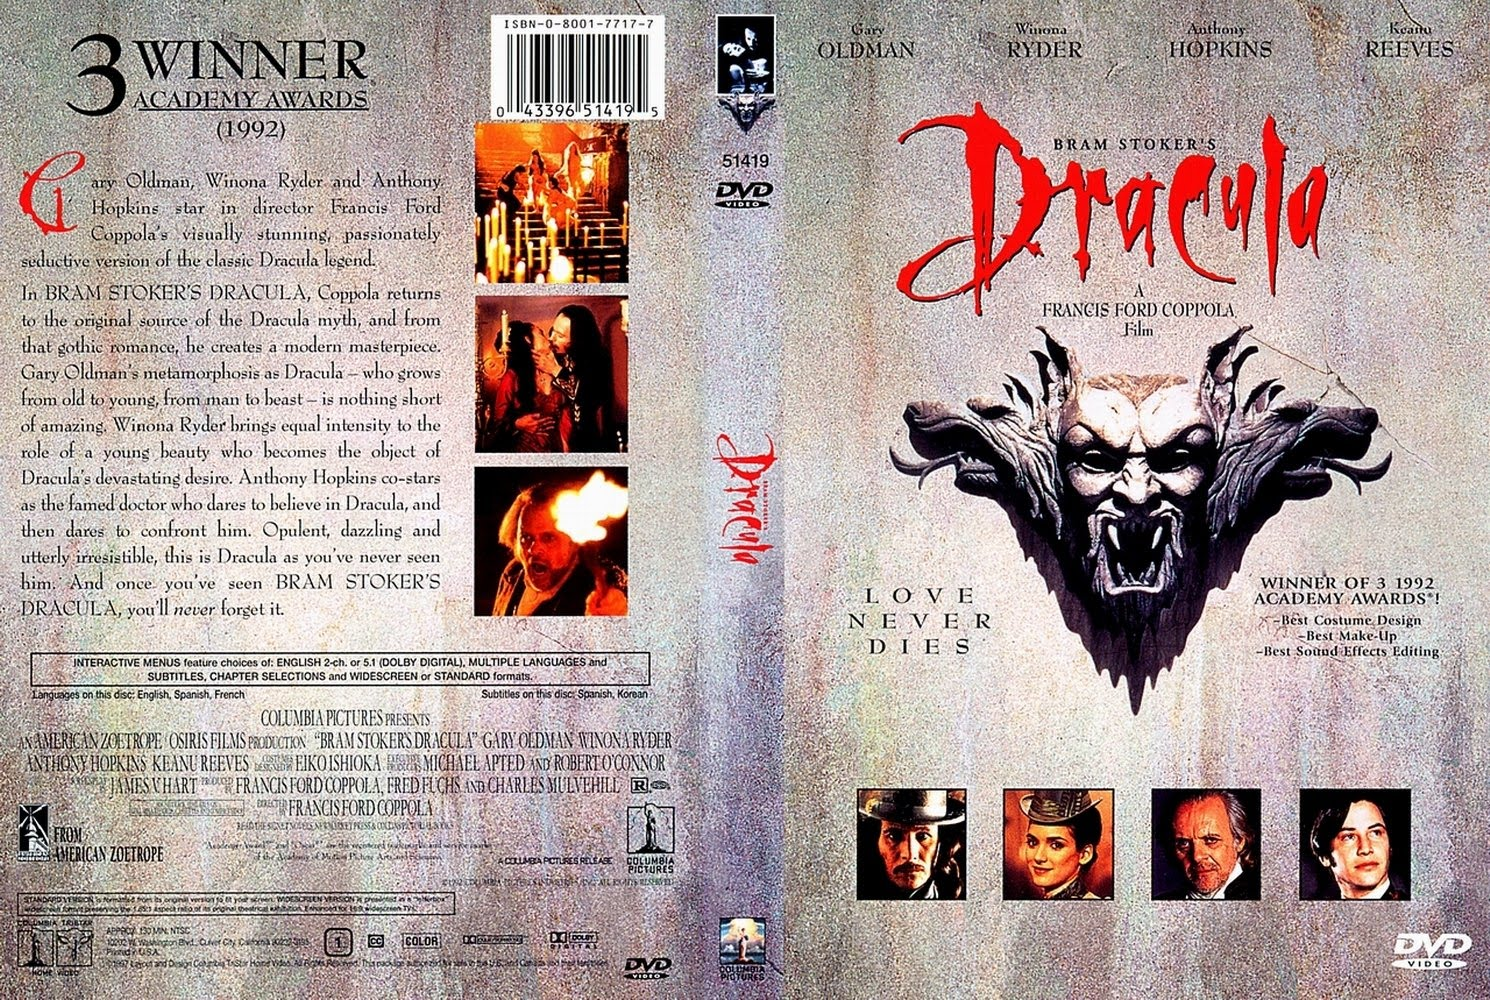 http://1.bp.blogspot.com/_tdWpP8yToYo/TA_s6RJWjZI/AAAAAAAAAcg/1bIXqu7IcRA/s1600/Bram+Stoker%27s+Dracula+01.jpg